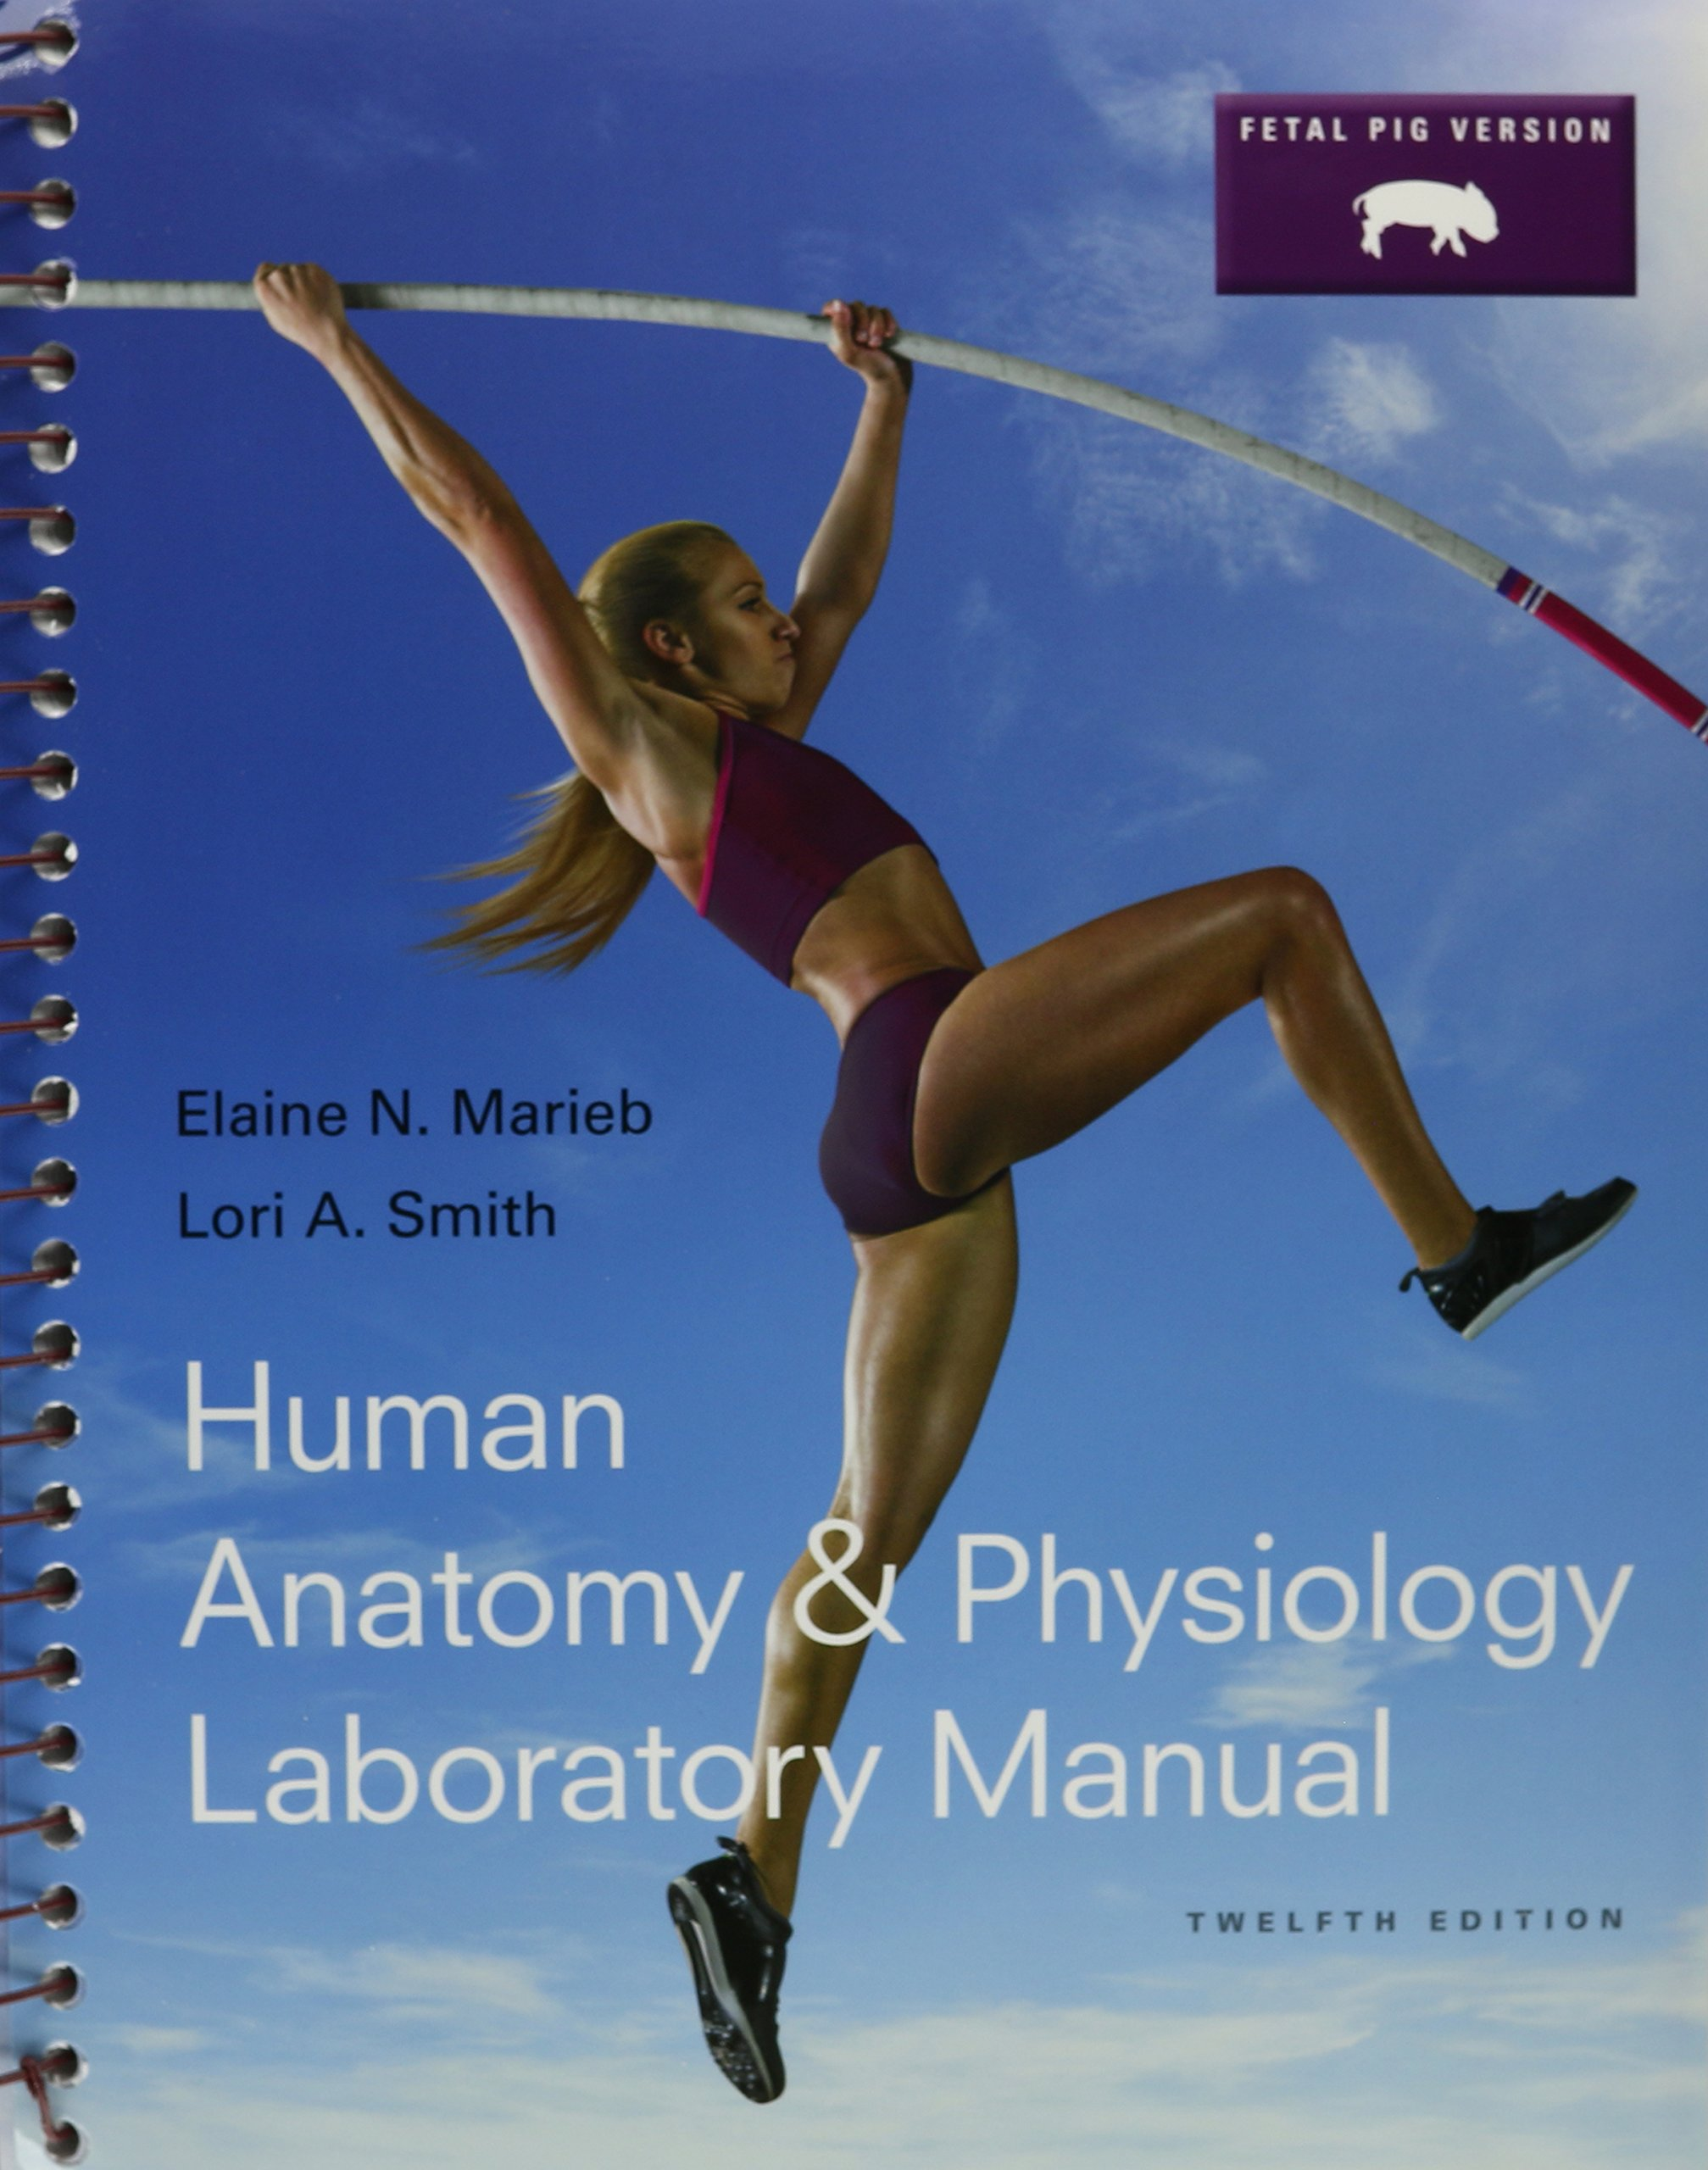 Human Anatomy & Physiology 10th Ed.+ Laboratory Manual 12th Ed ...